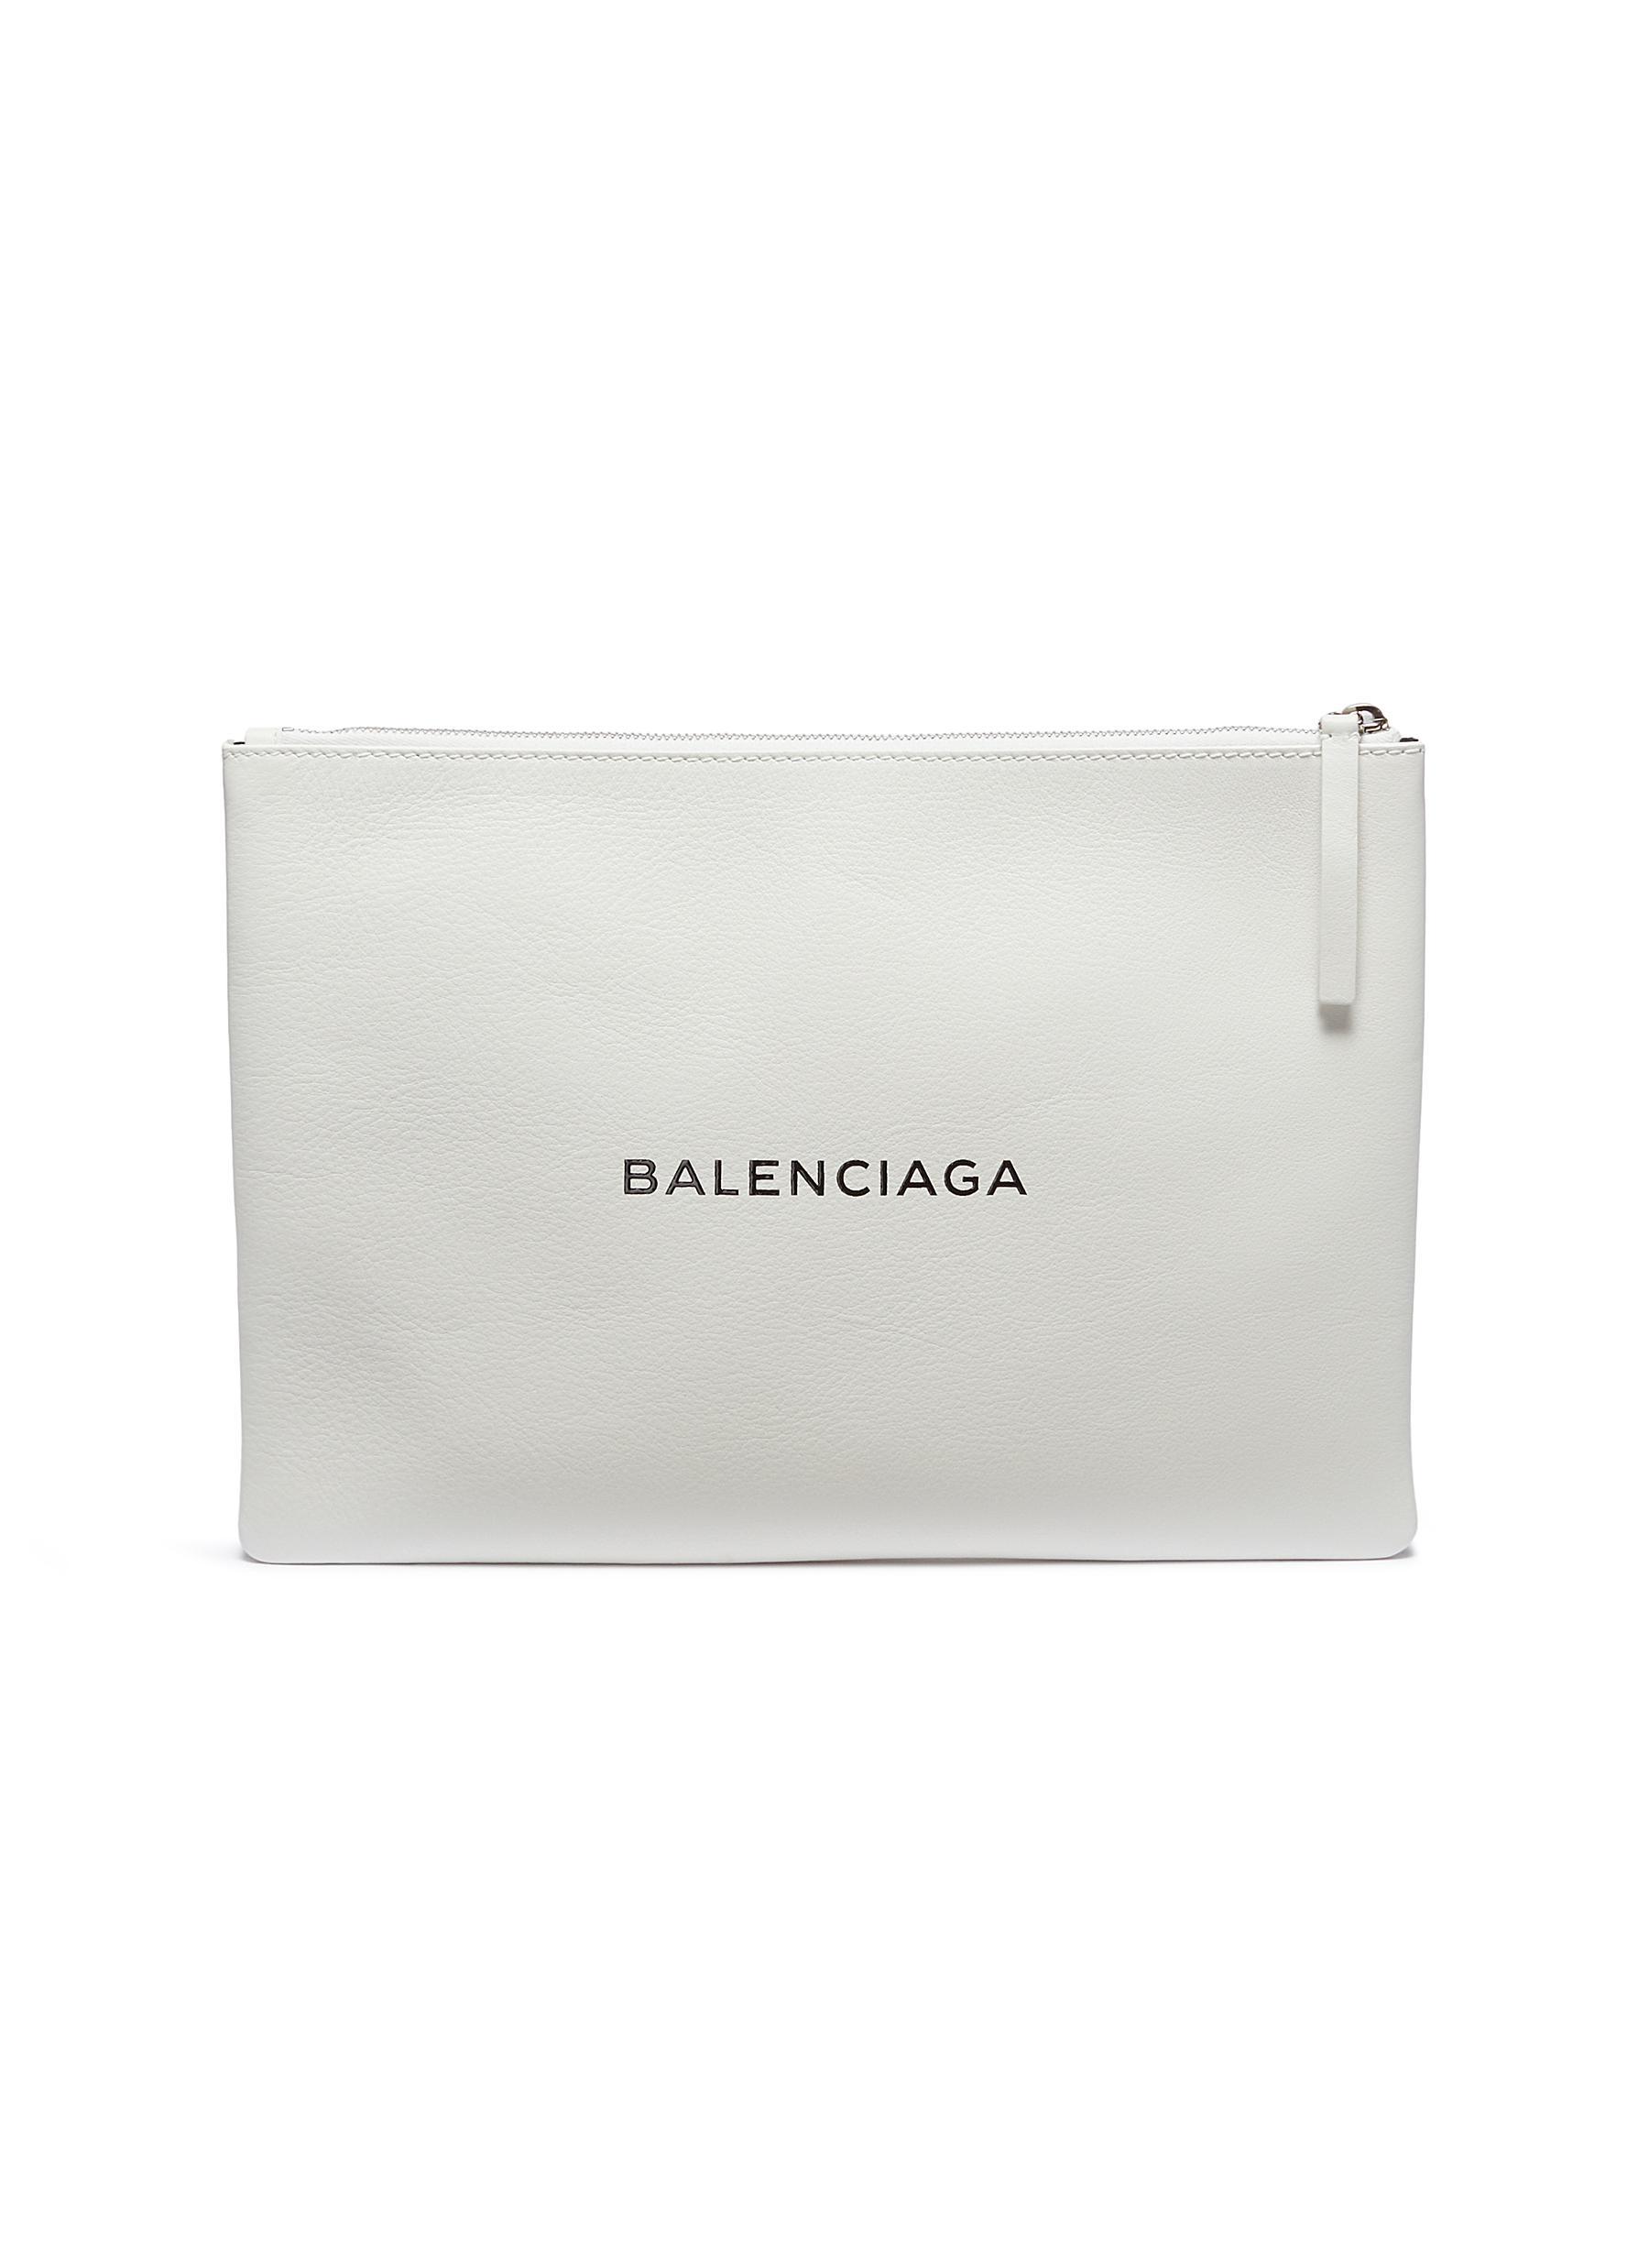 Balenciaga 'Everyday' Logo Print Leather Zip Pouch In White